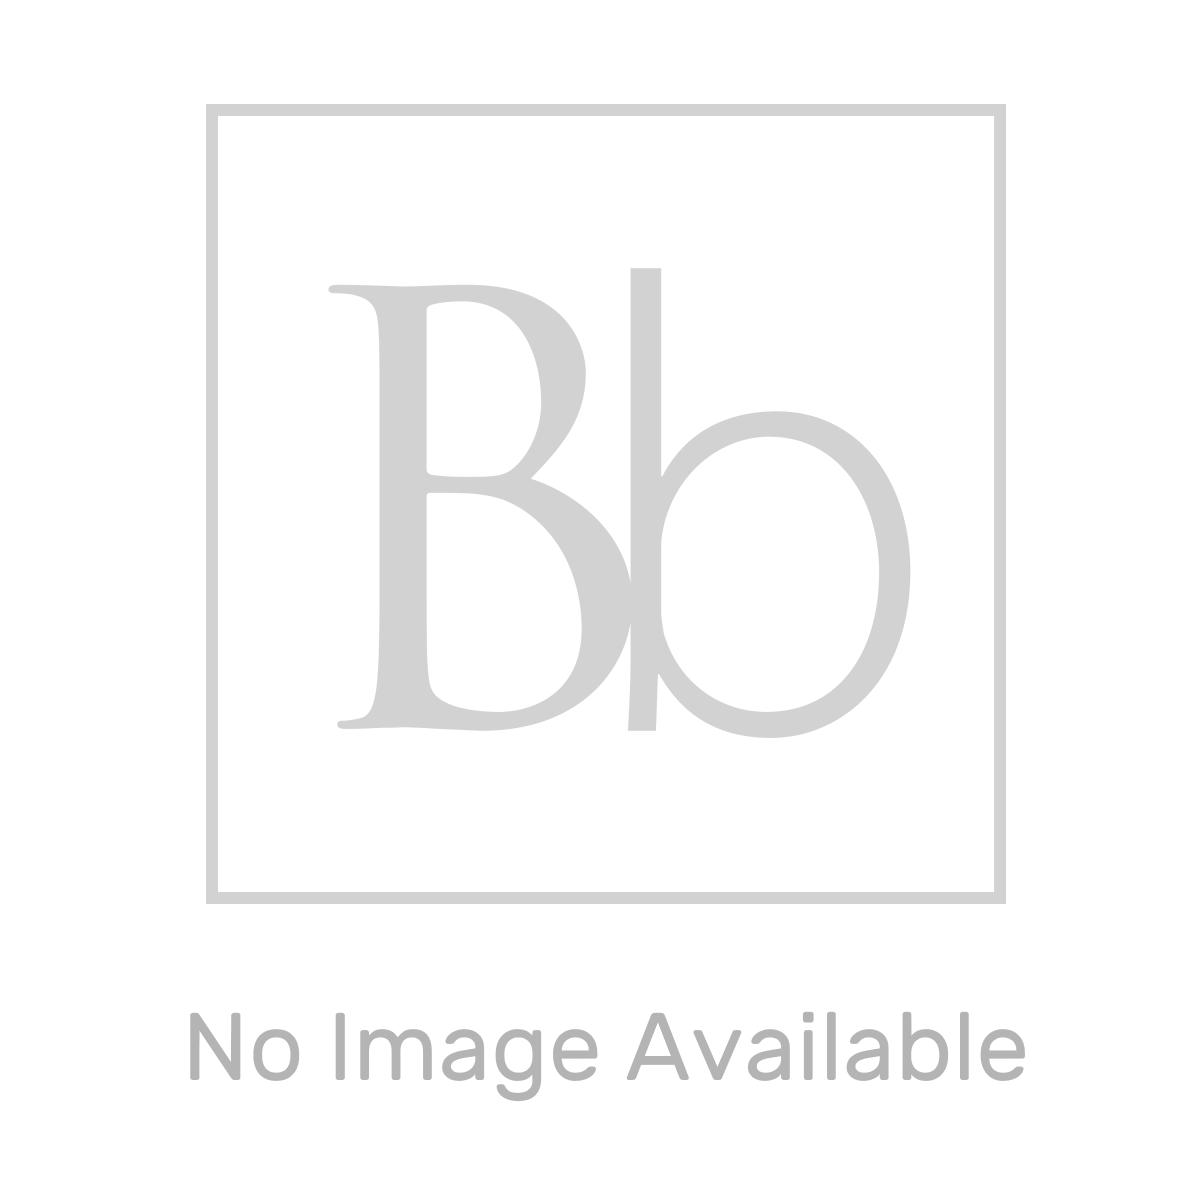 RAK Series 600 Close Coupled Toilet and 400 Series Gloss White Mini Vanity Unit Front